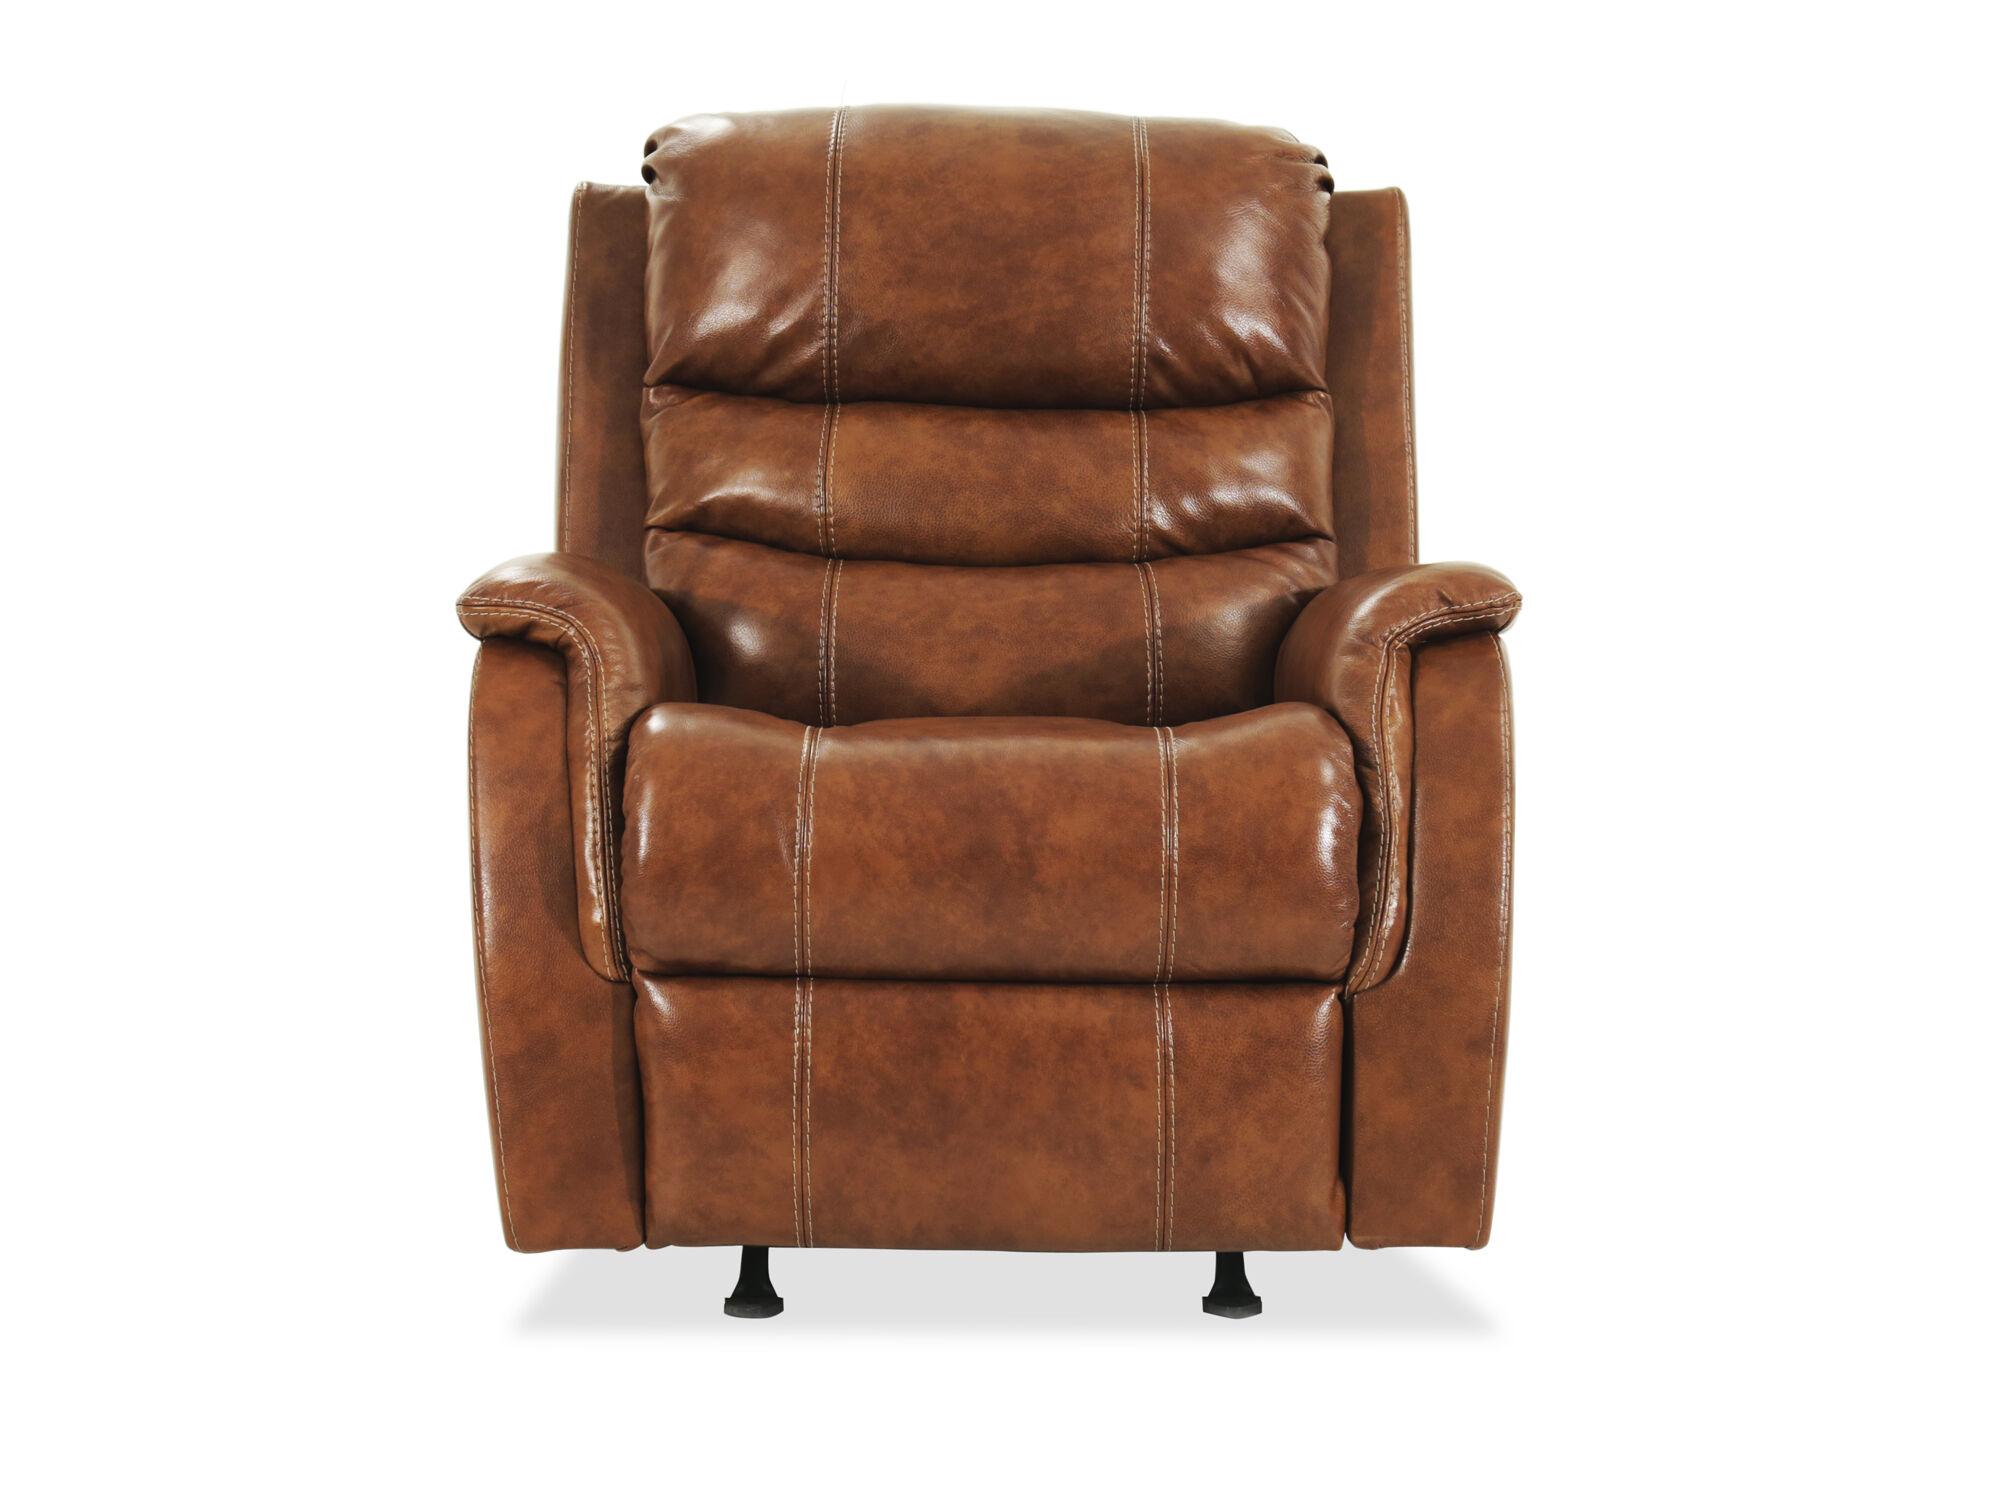 ashley metcalf nutmeg power recliner with adjustable headrest - Serta Recliners